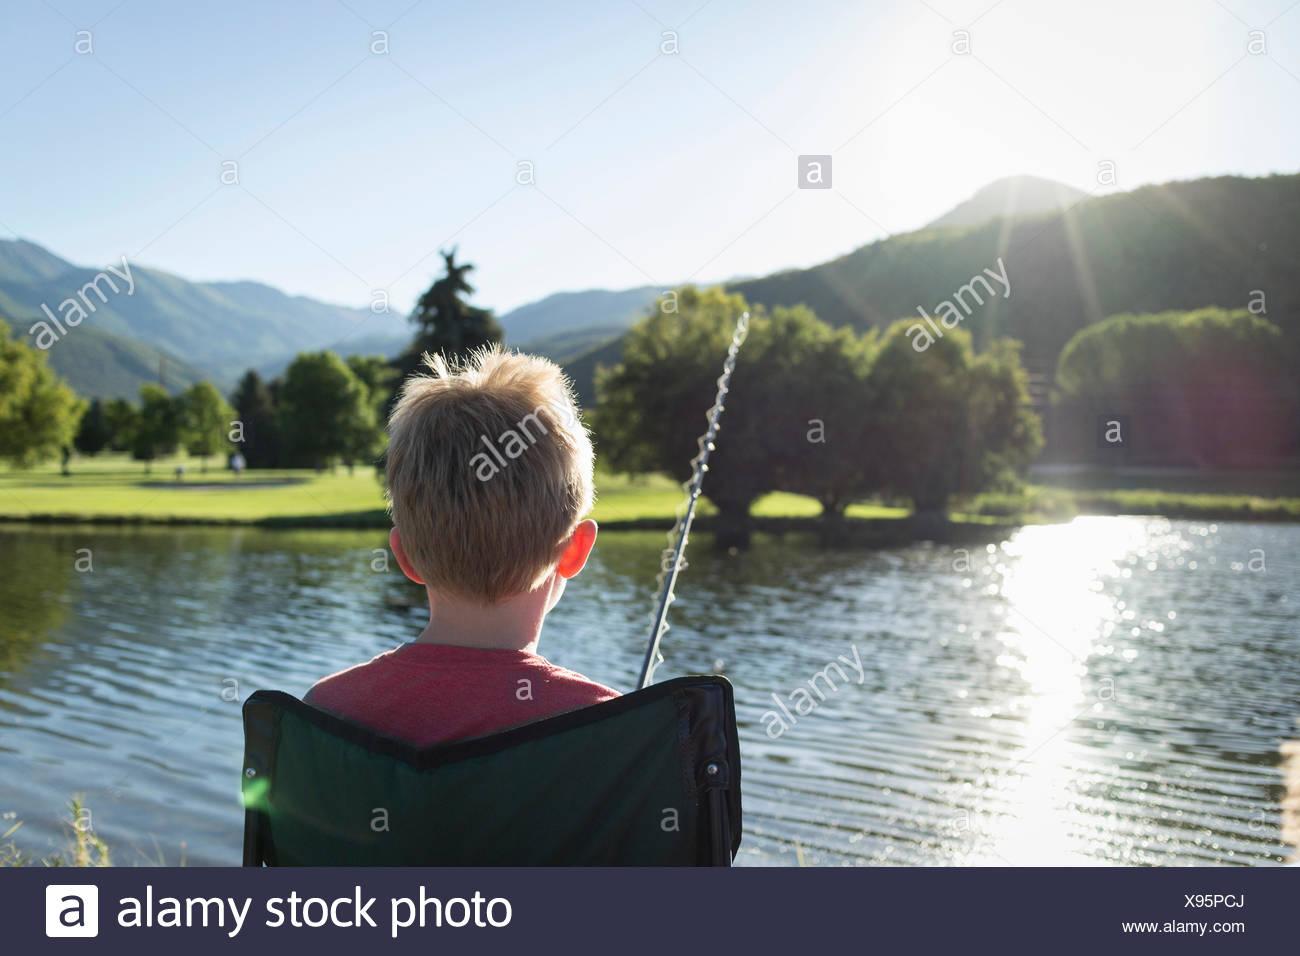 Young boy fishing, rear view, Washington State Park, Utah, USA - Stock Image